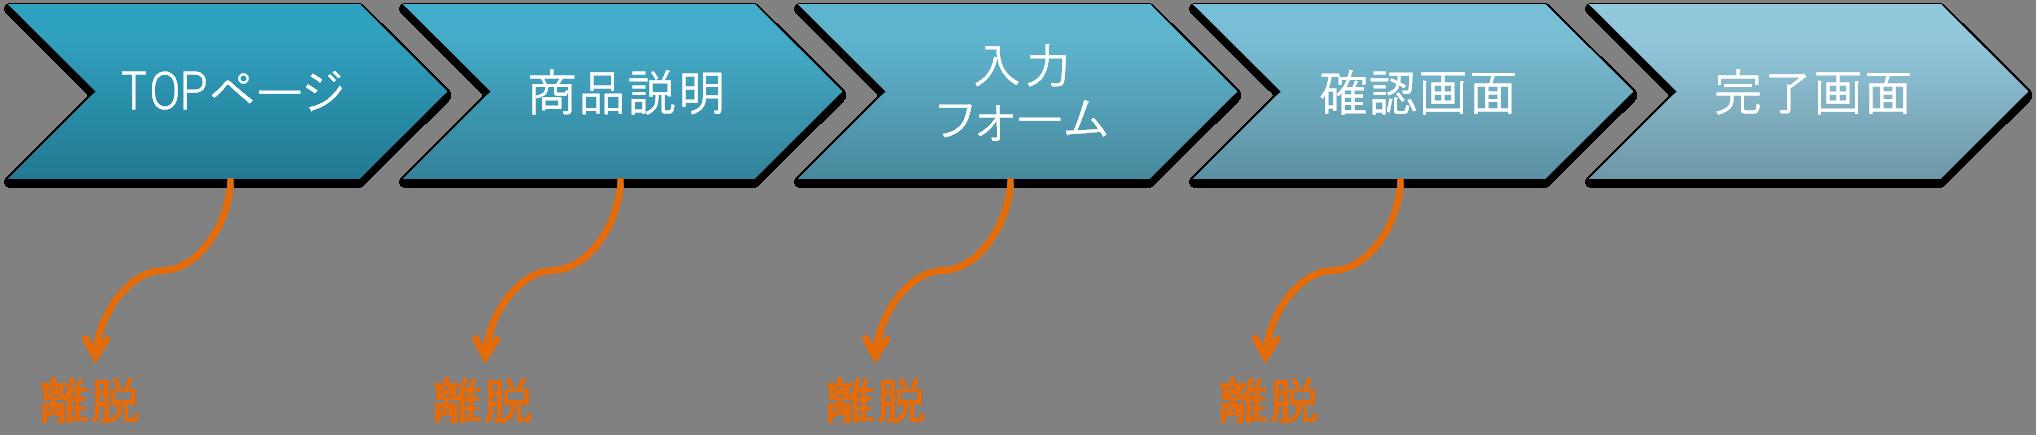 20140729_01